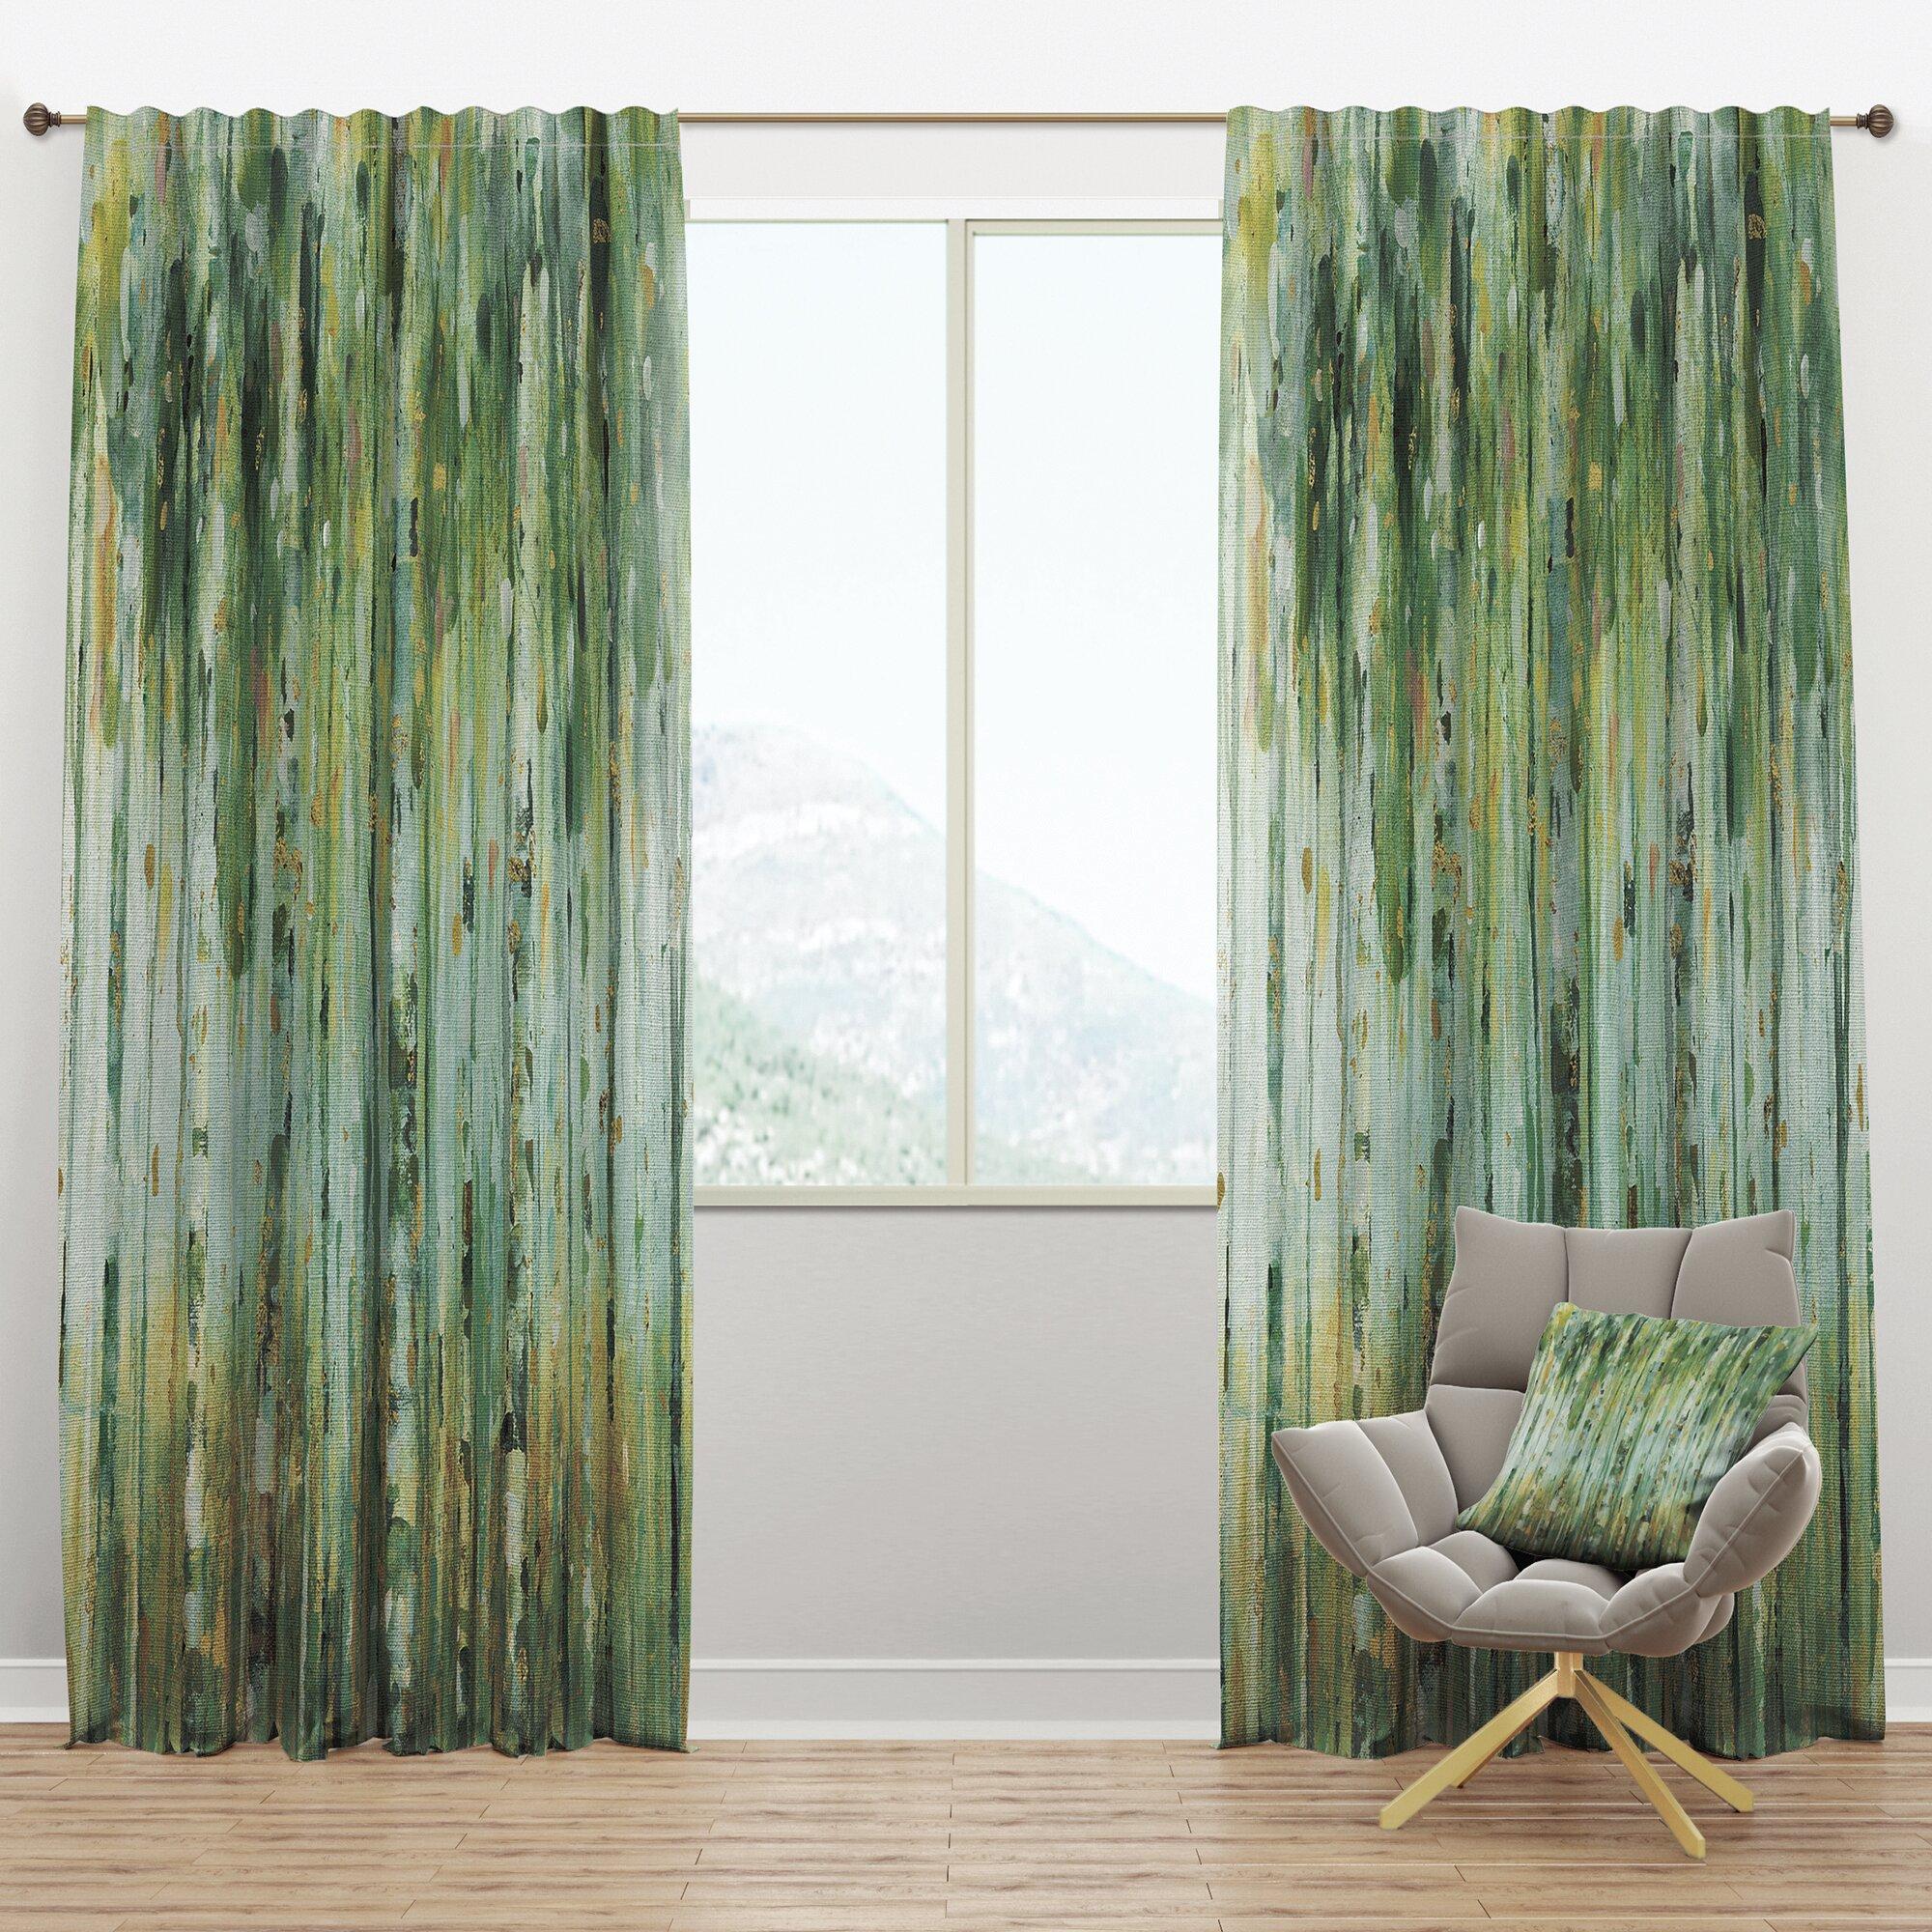 Designart The Birch Forest Ii Abstract Semi Sheer Thermal Rod Pocket Curtain Panel Wayfair